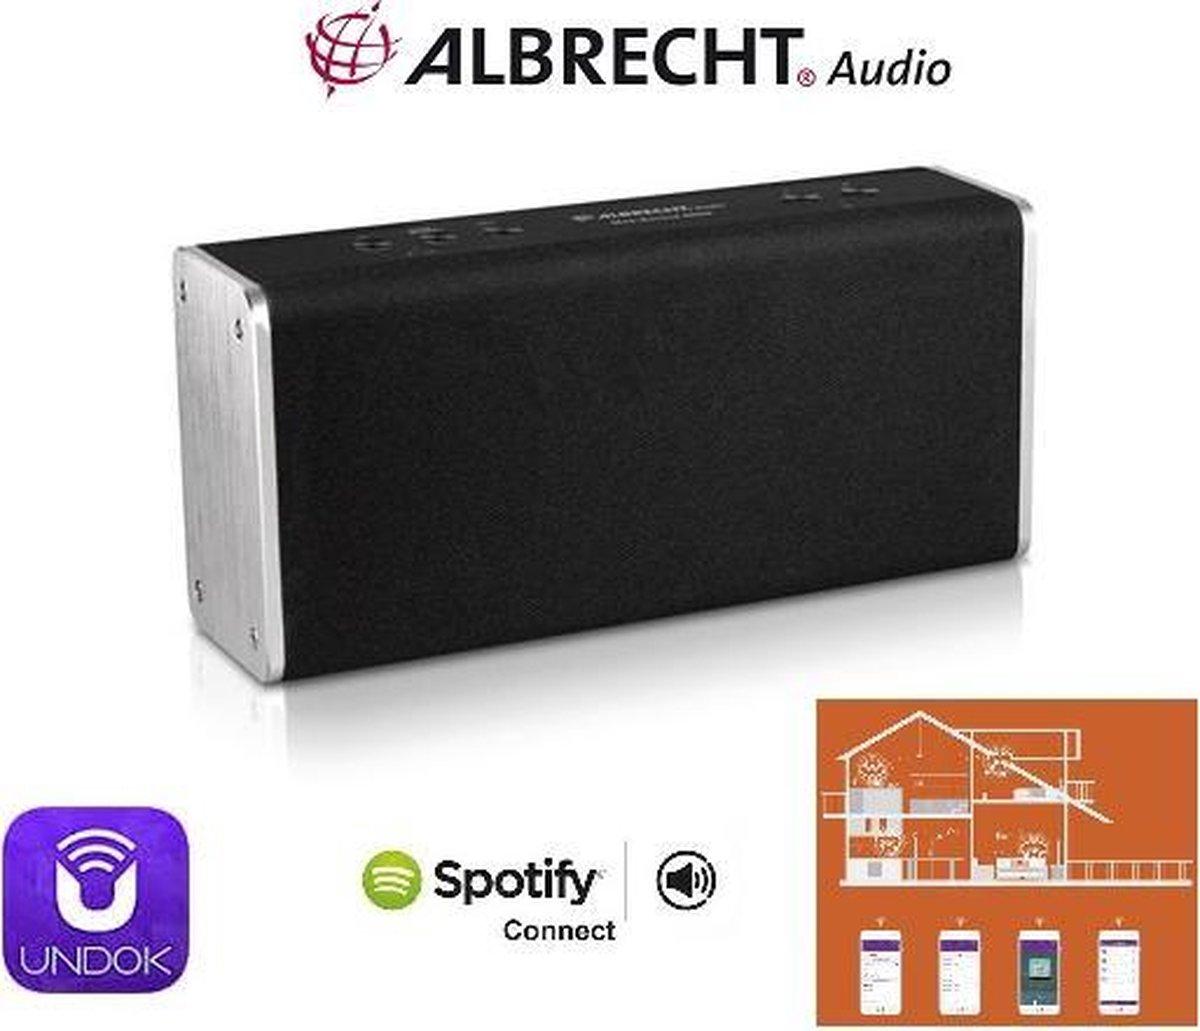 Albrecht Max-Sound 900S Multiroom luidspreker - internet radio - Spotify connect